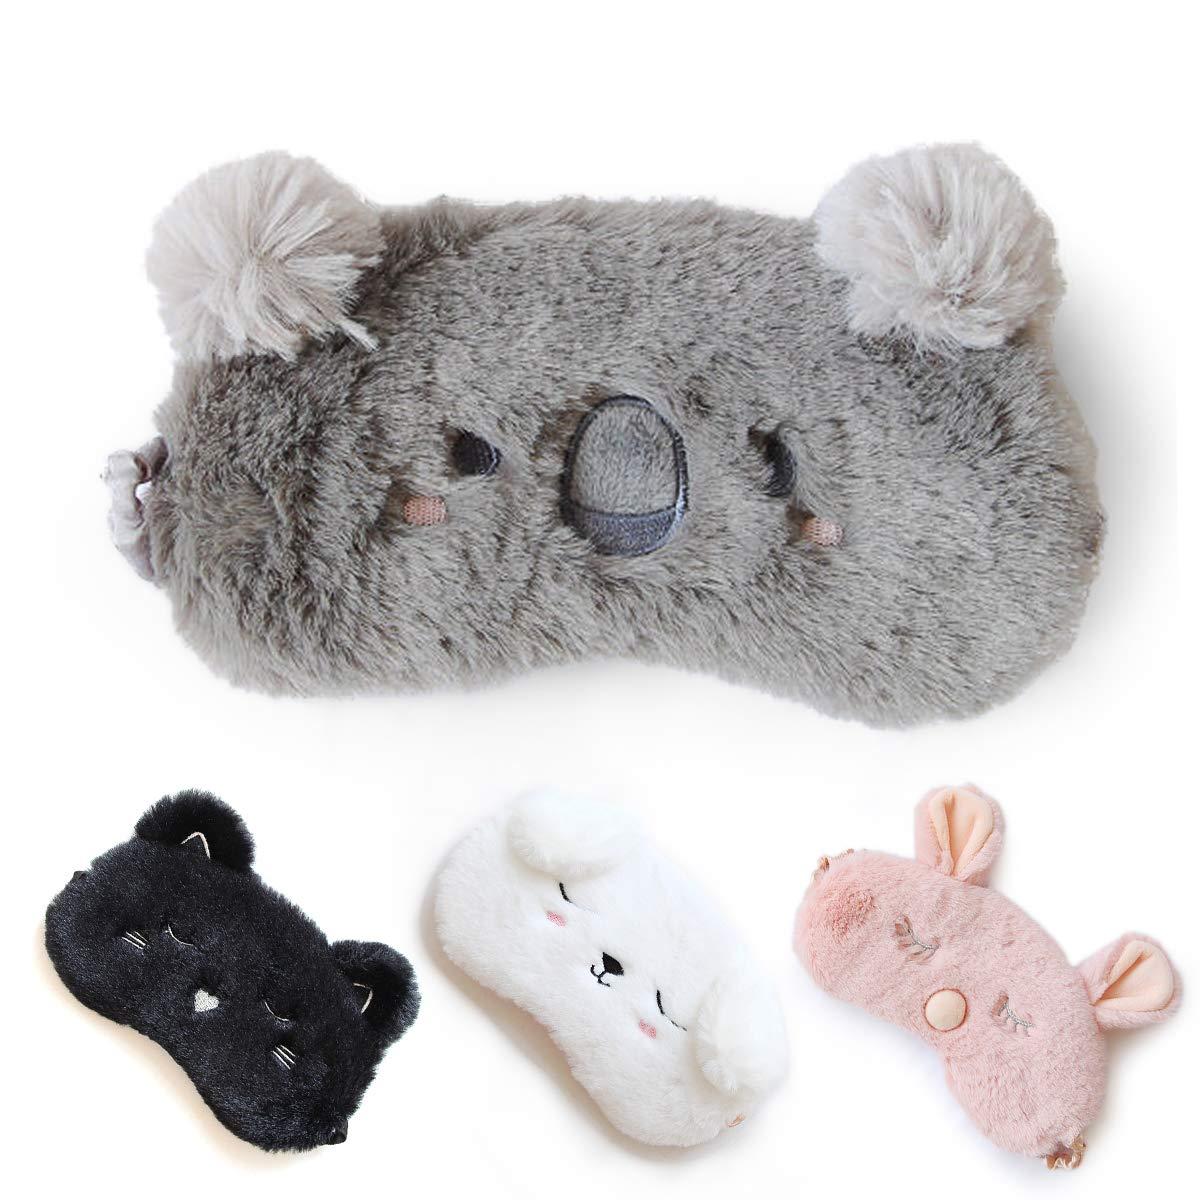 Cute Sleep Mask - Soft and Comfortable Animal Plush Blindfold Eye Cover for Kids Girls Women, Great Eyeshade for Travel, Shift Work, Meditation, Washable (Black) HOMEWINS